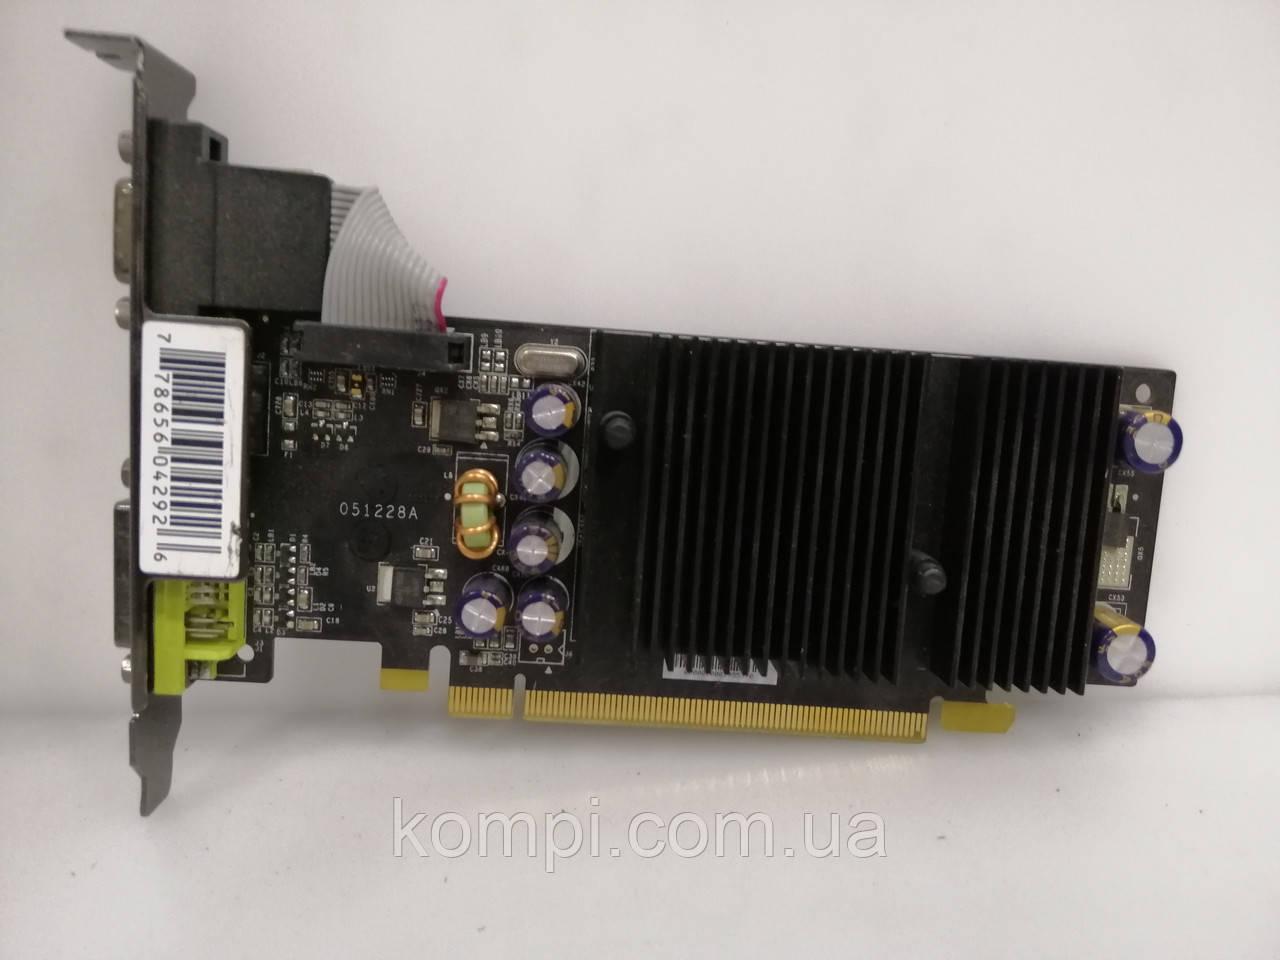 Видеокарта NVIDIA 6200 128 MB PCI-E